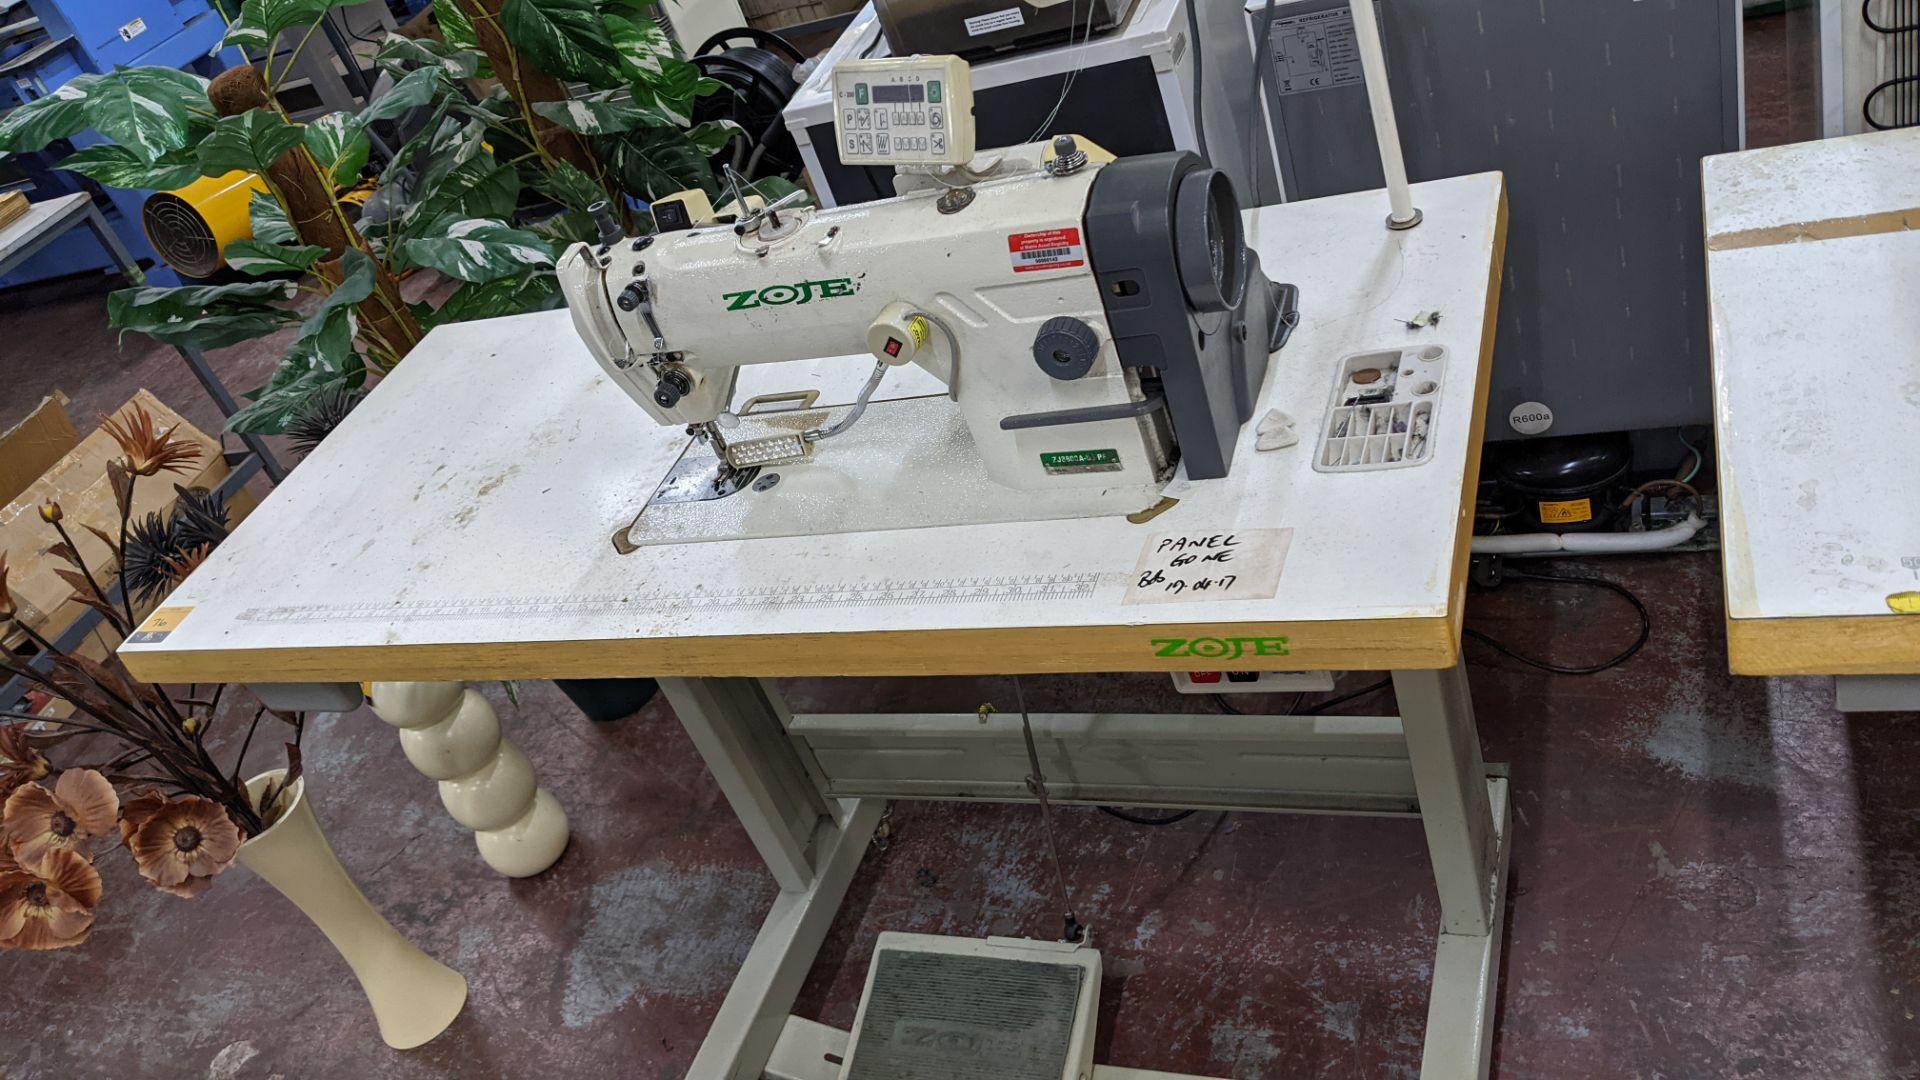 Zoje model ZJ8800A-D3/PF sewing machine with model C-200 digital controller